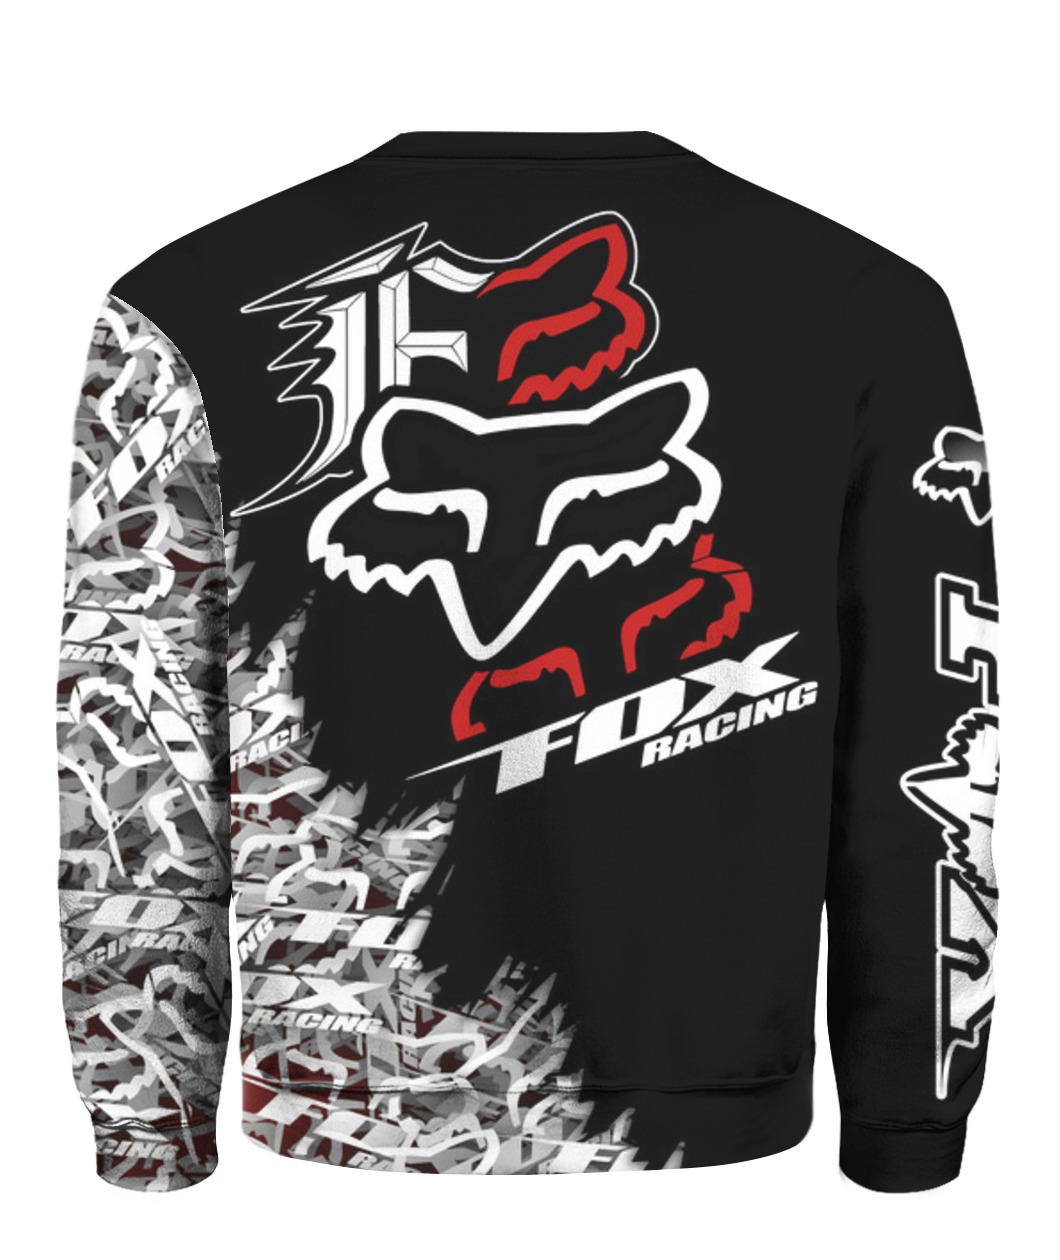 Fox racing full printing sweatshirt - back